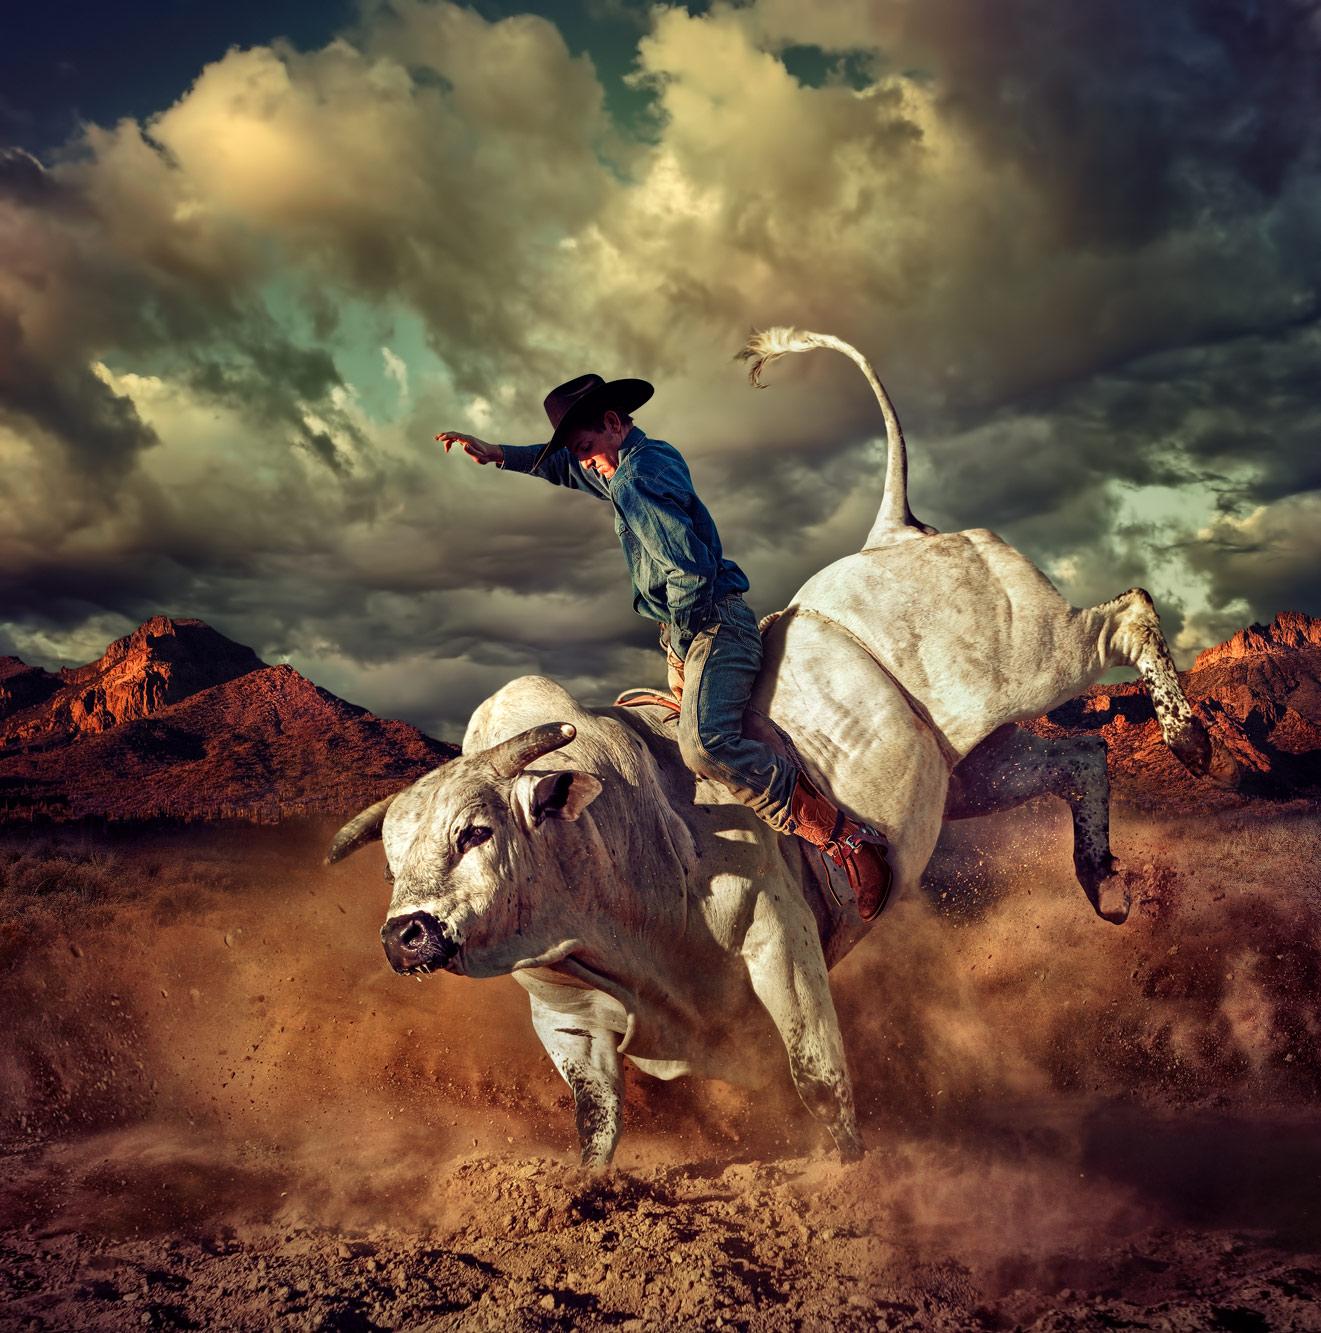 Chris Clor Cowboy riding a white bull